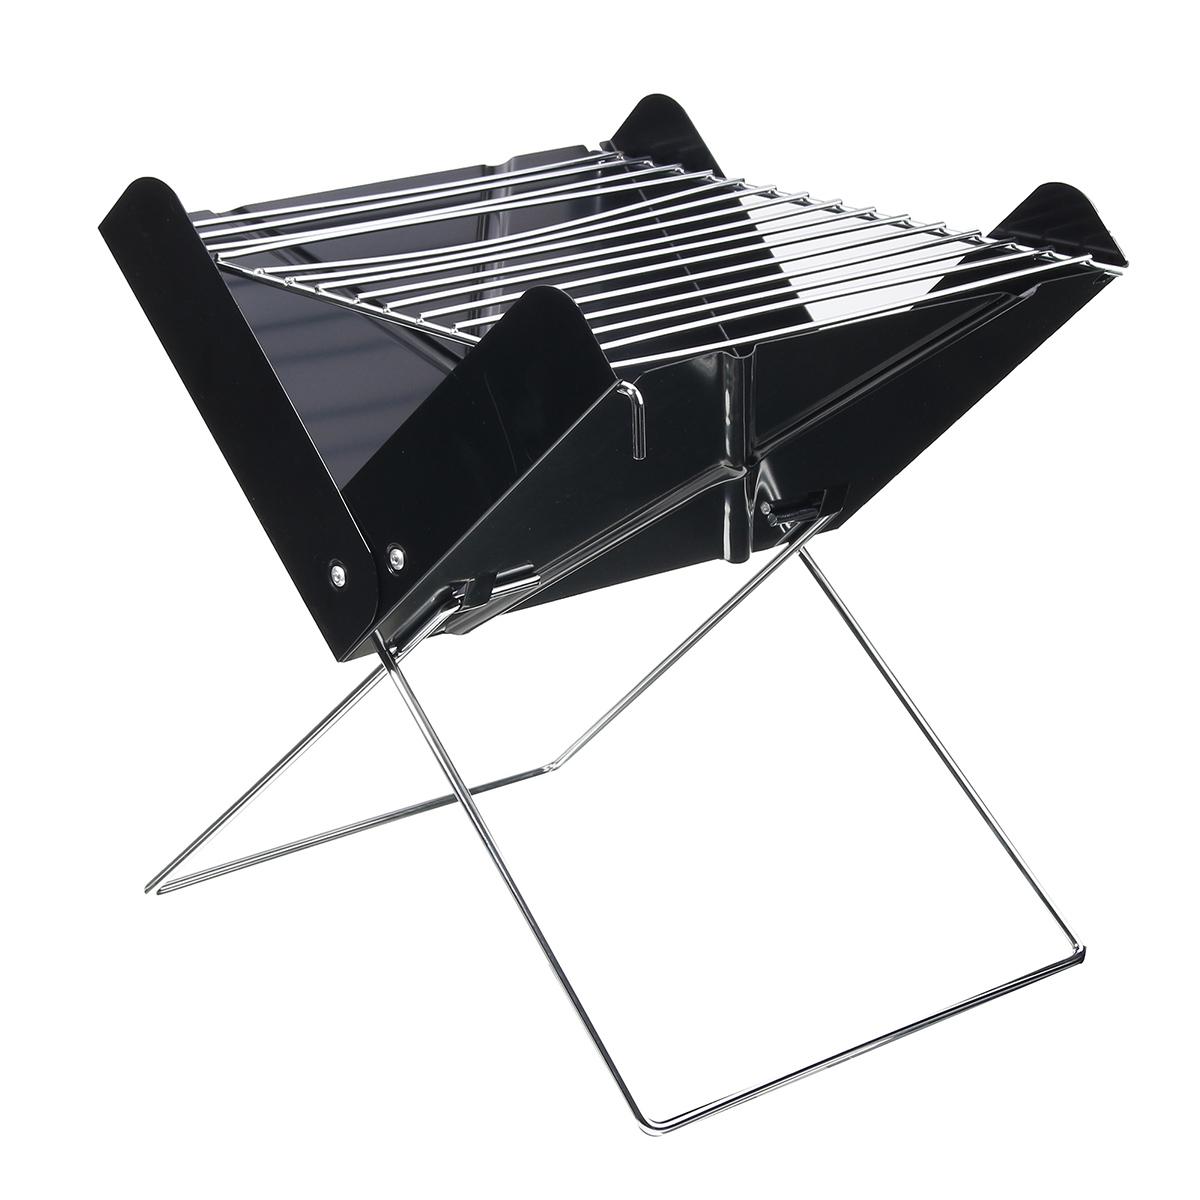 Outdoor Portable Folding BBQ Grill Barbecue Garden Camp